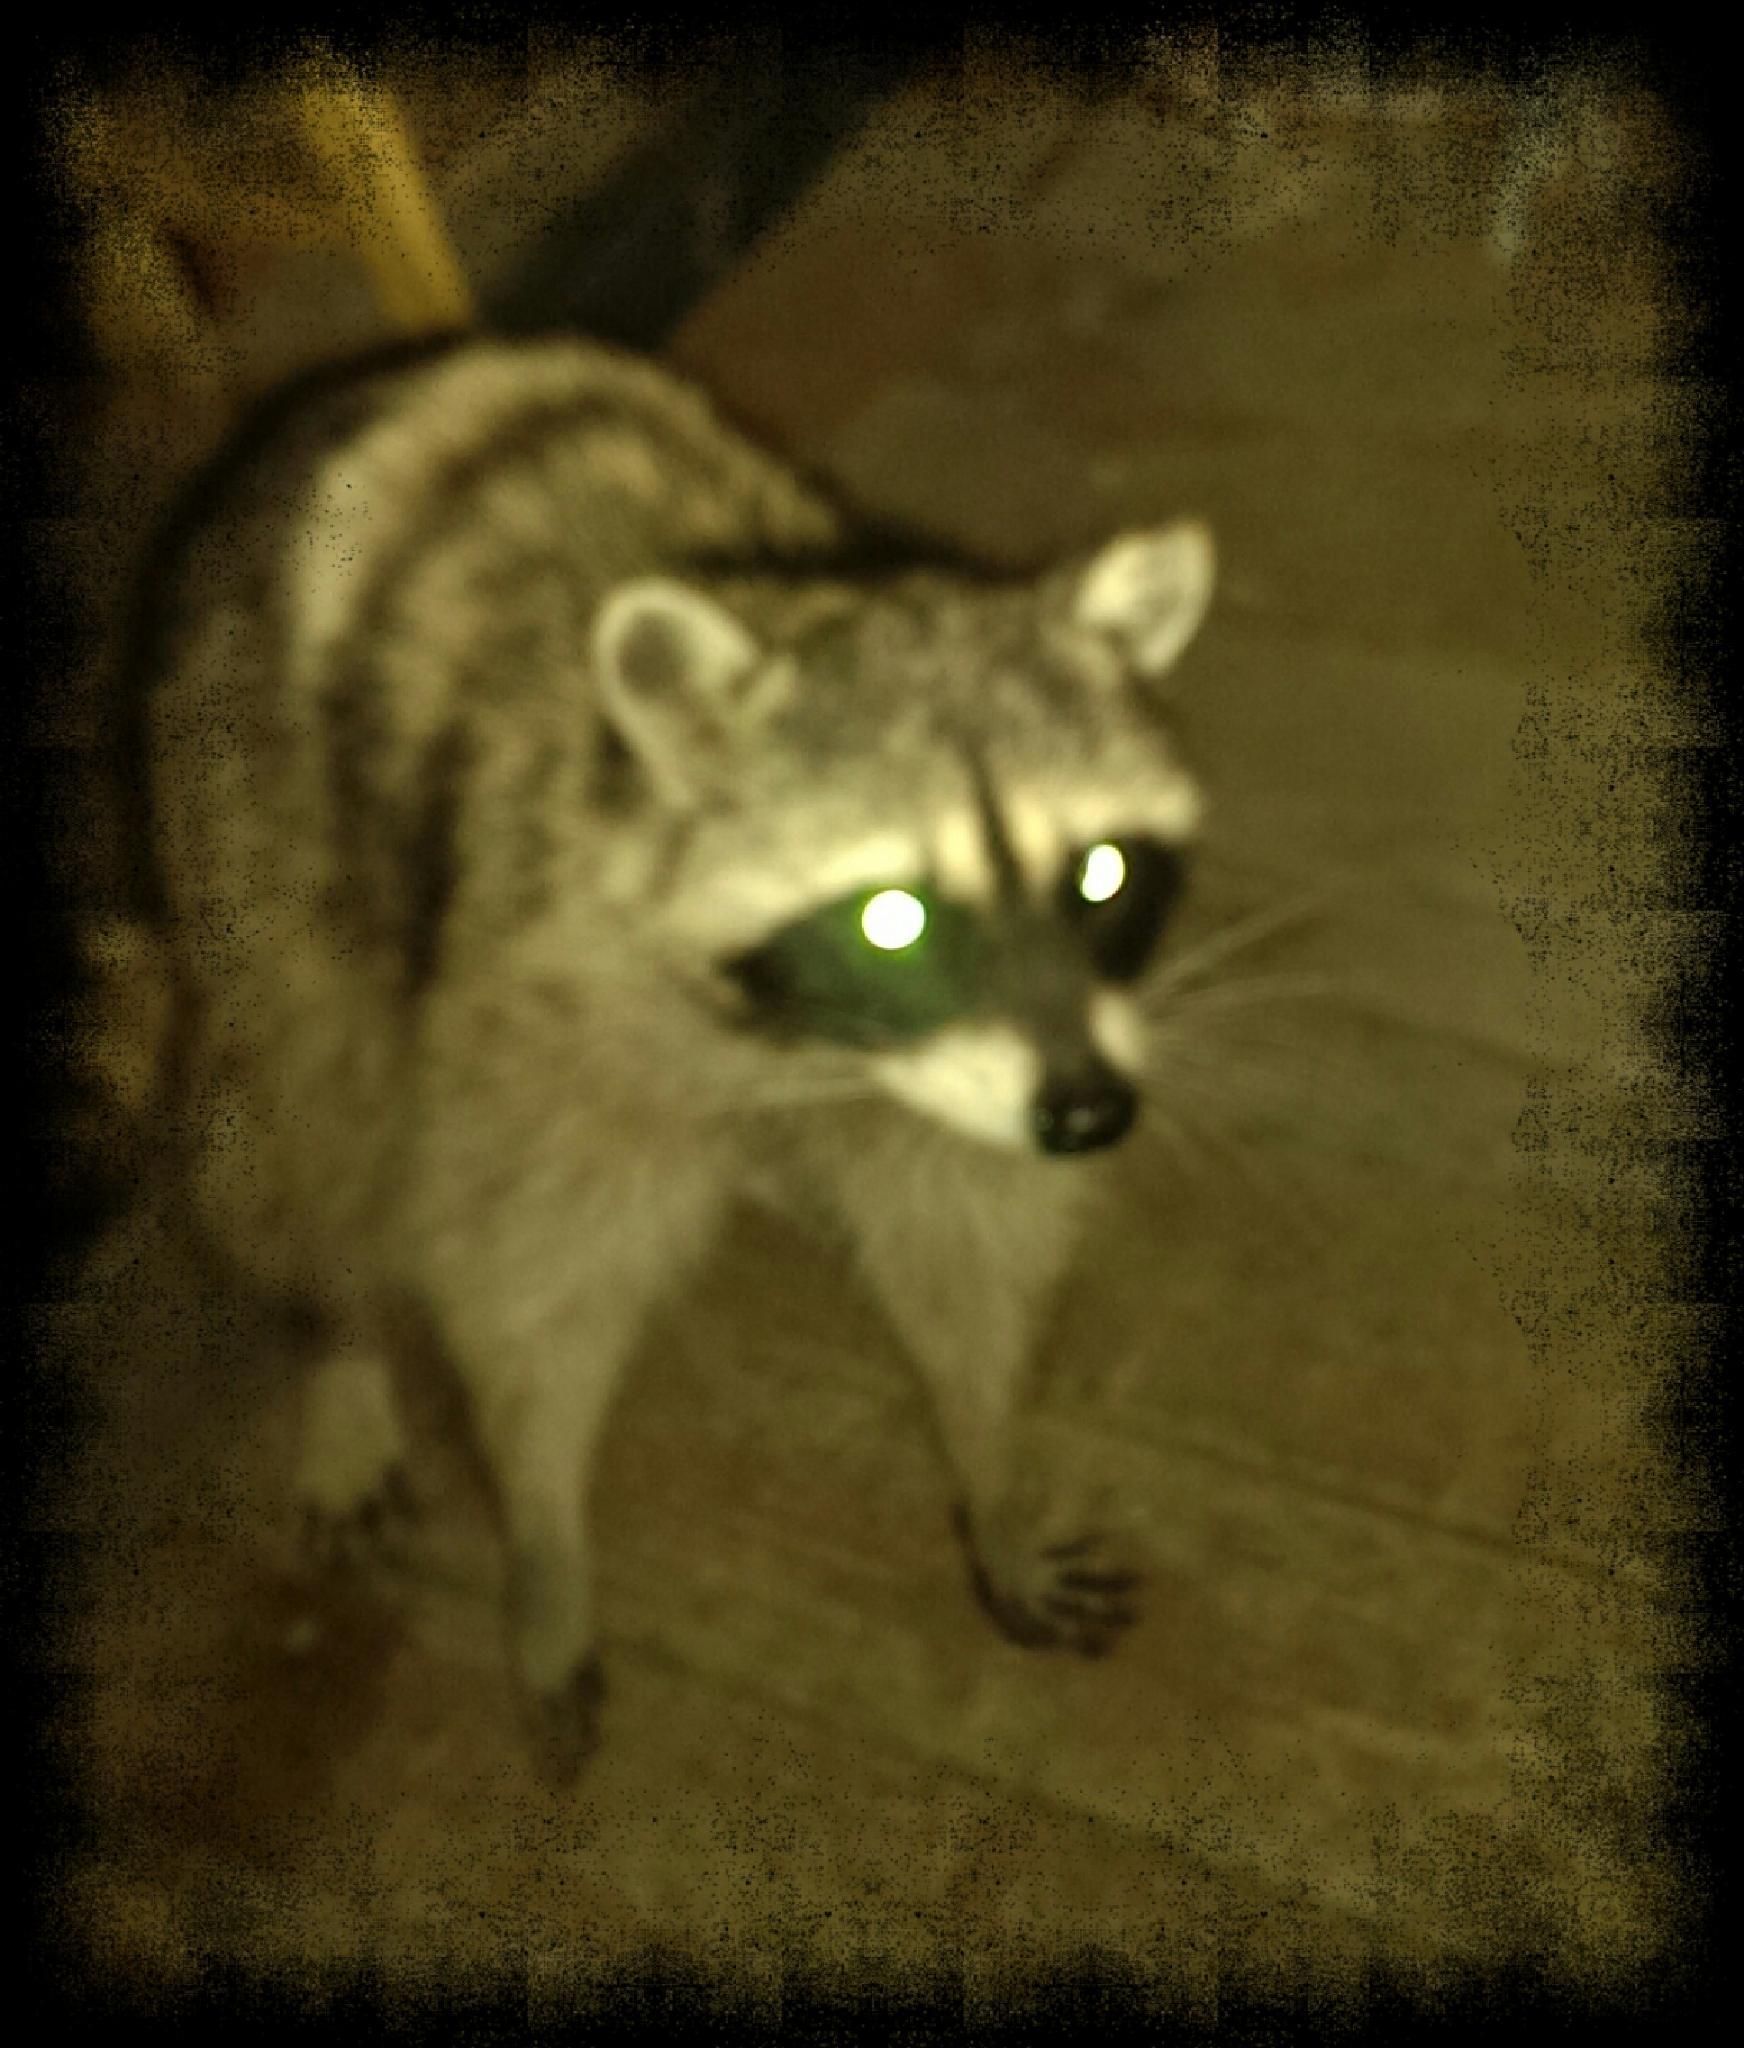 Raccoon by tramilo